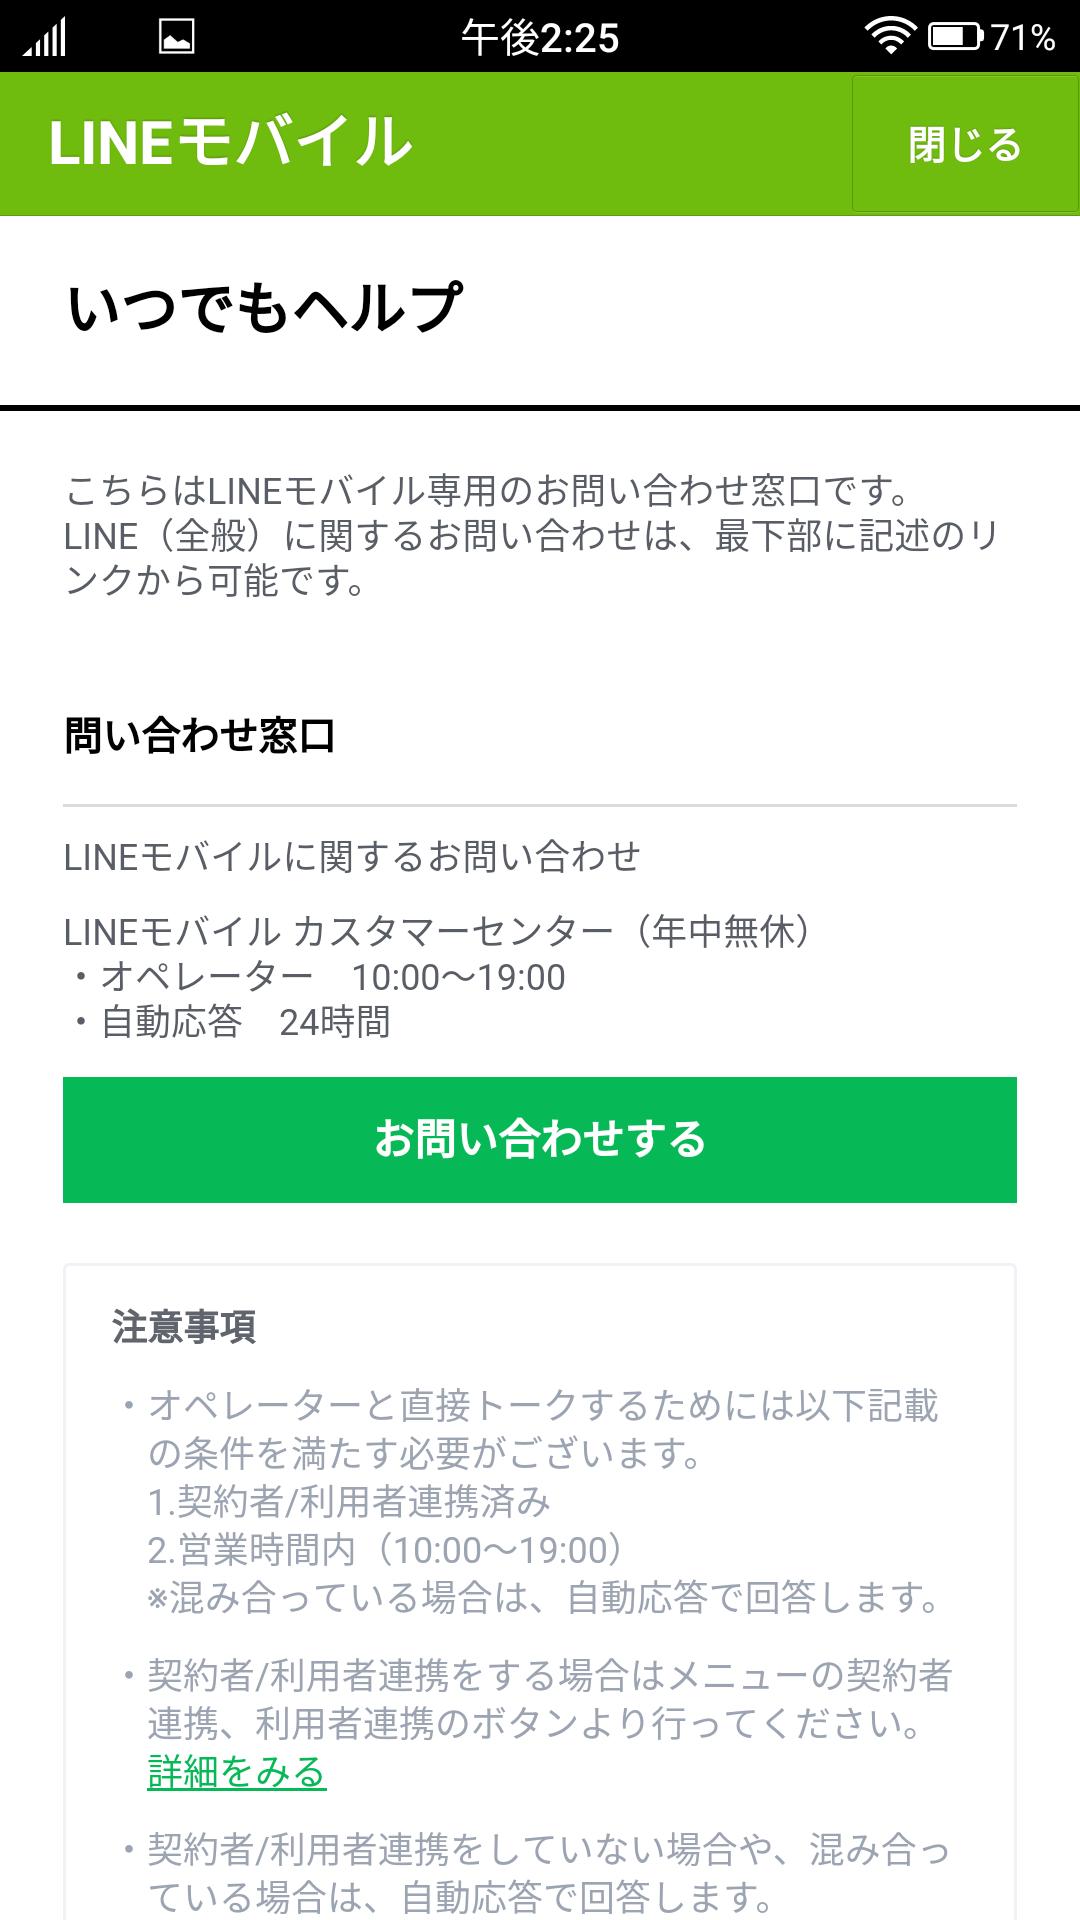 LINEモバイル:LINEアカウントで利用者連携その4